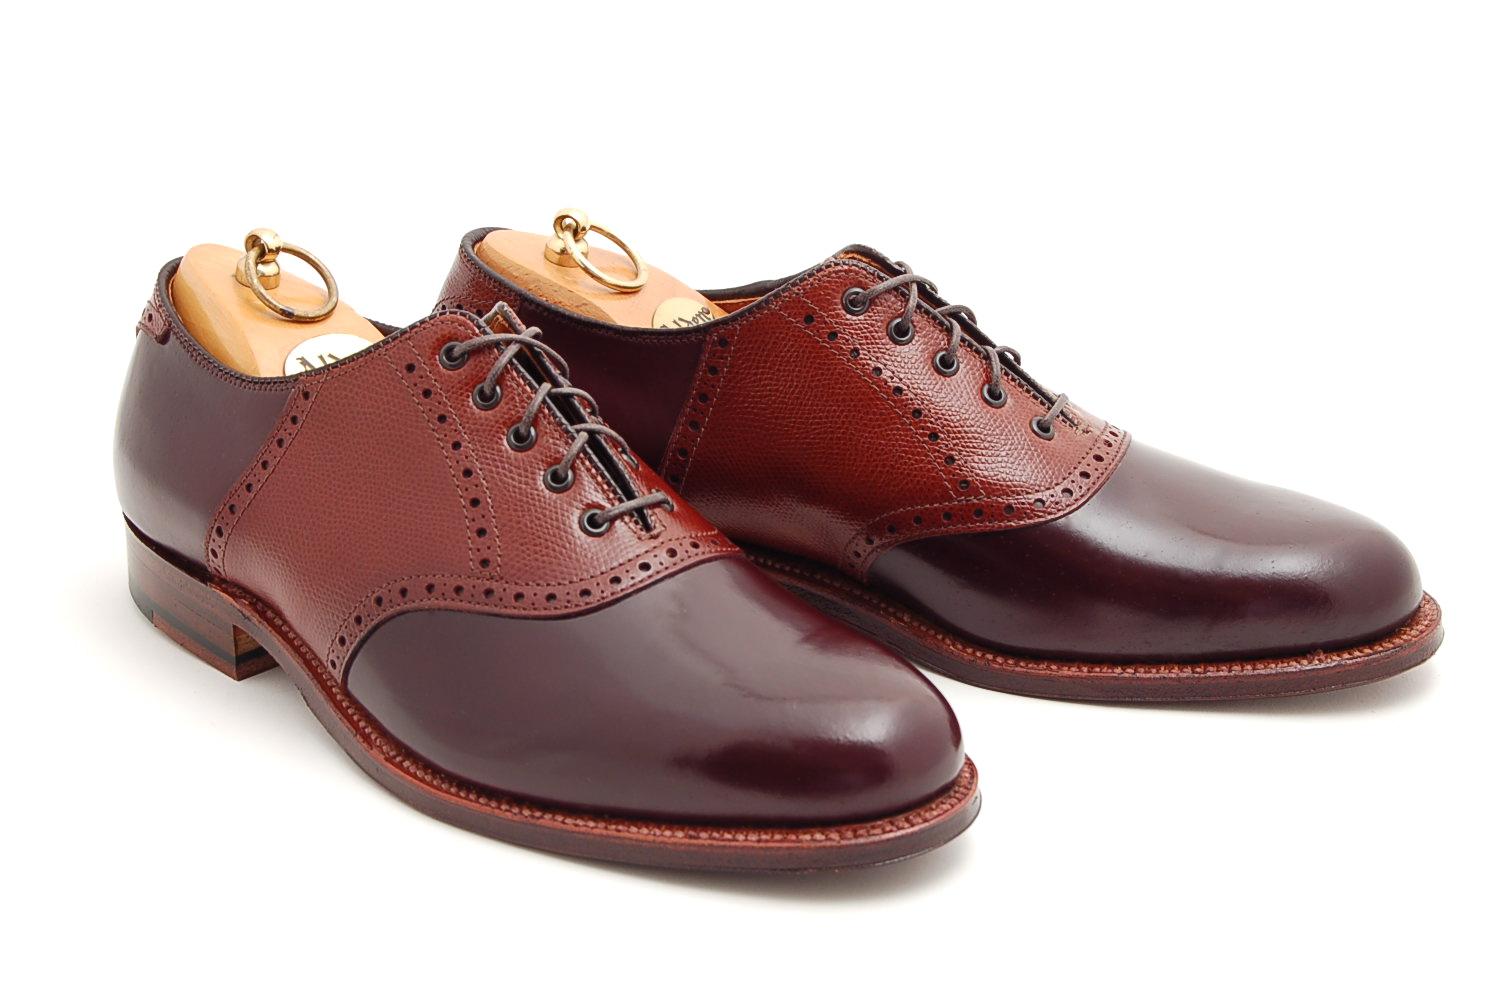 Zapatos  moumizafforafattoamano